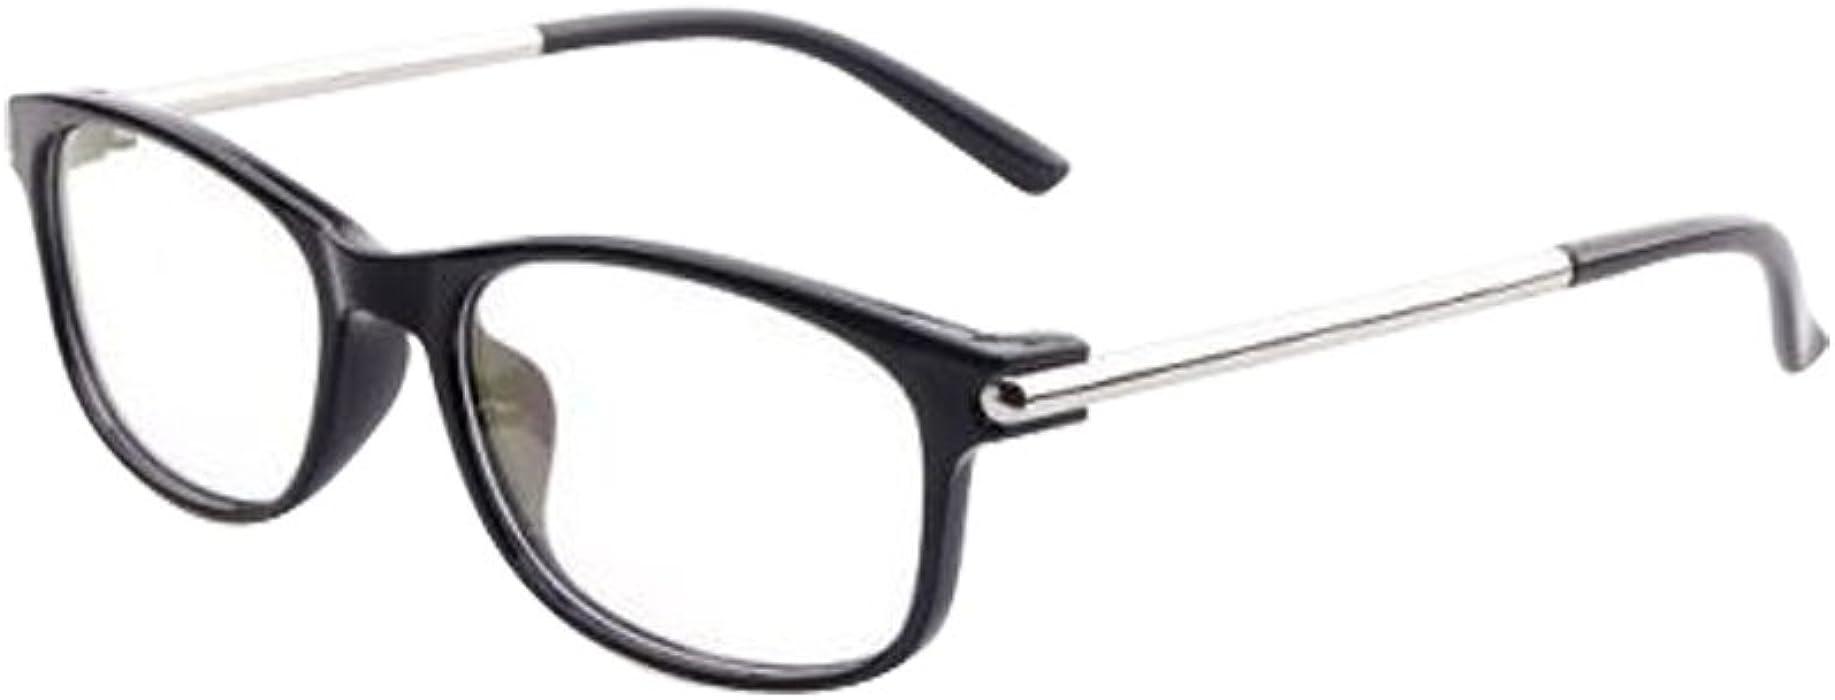 ab66bd1abbe Amazon.com  Glasses non prescription Bright Black 12 colors Man Women  Master Eyeglass Frame Metal Full-Rim Glasses Spectacles RX glasses headband  eyewear ...